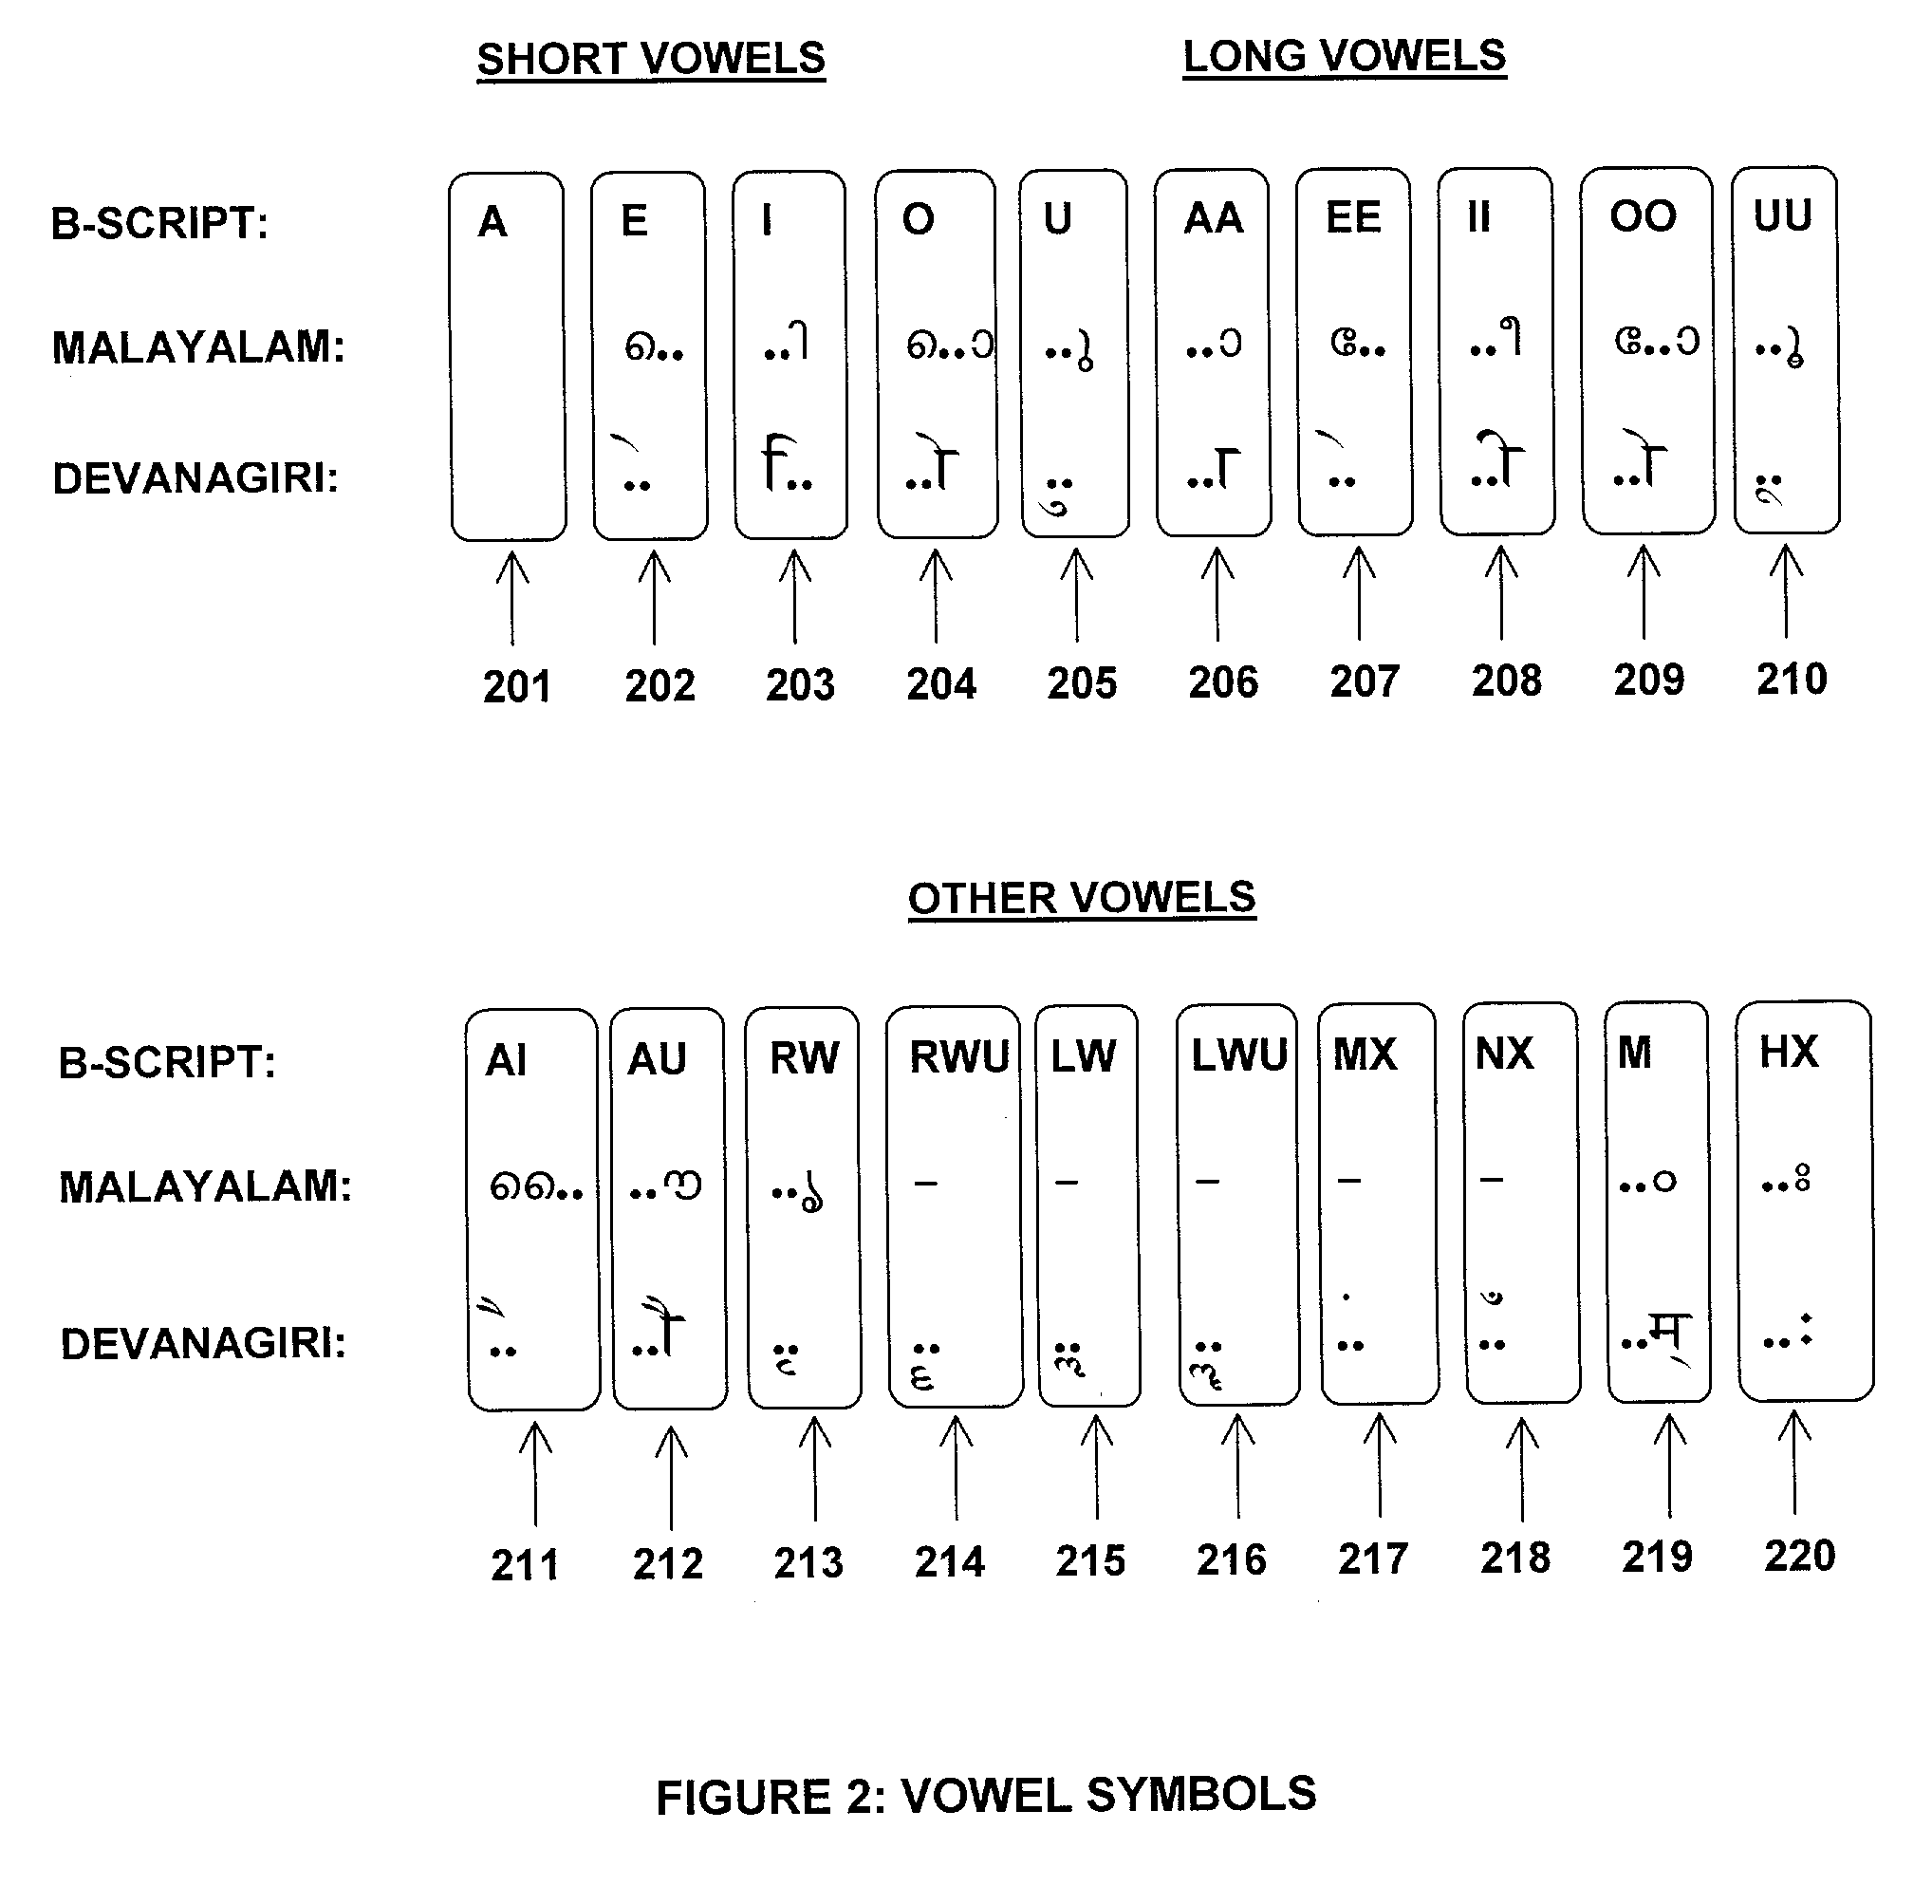 ... for writing Indian languages using English alphabet - Google Patents